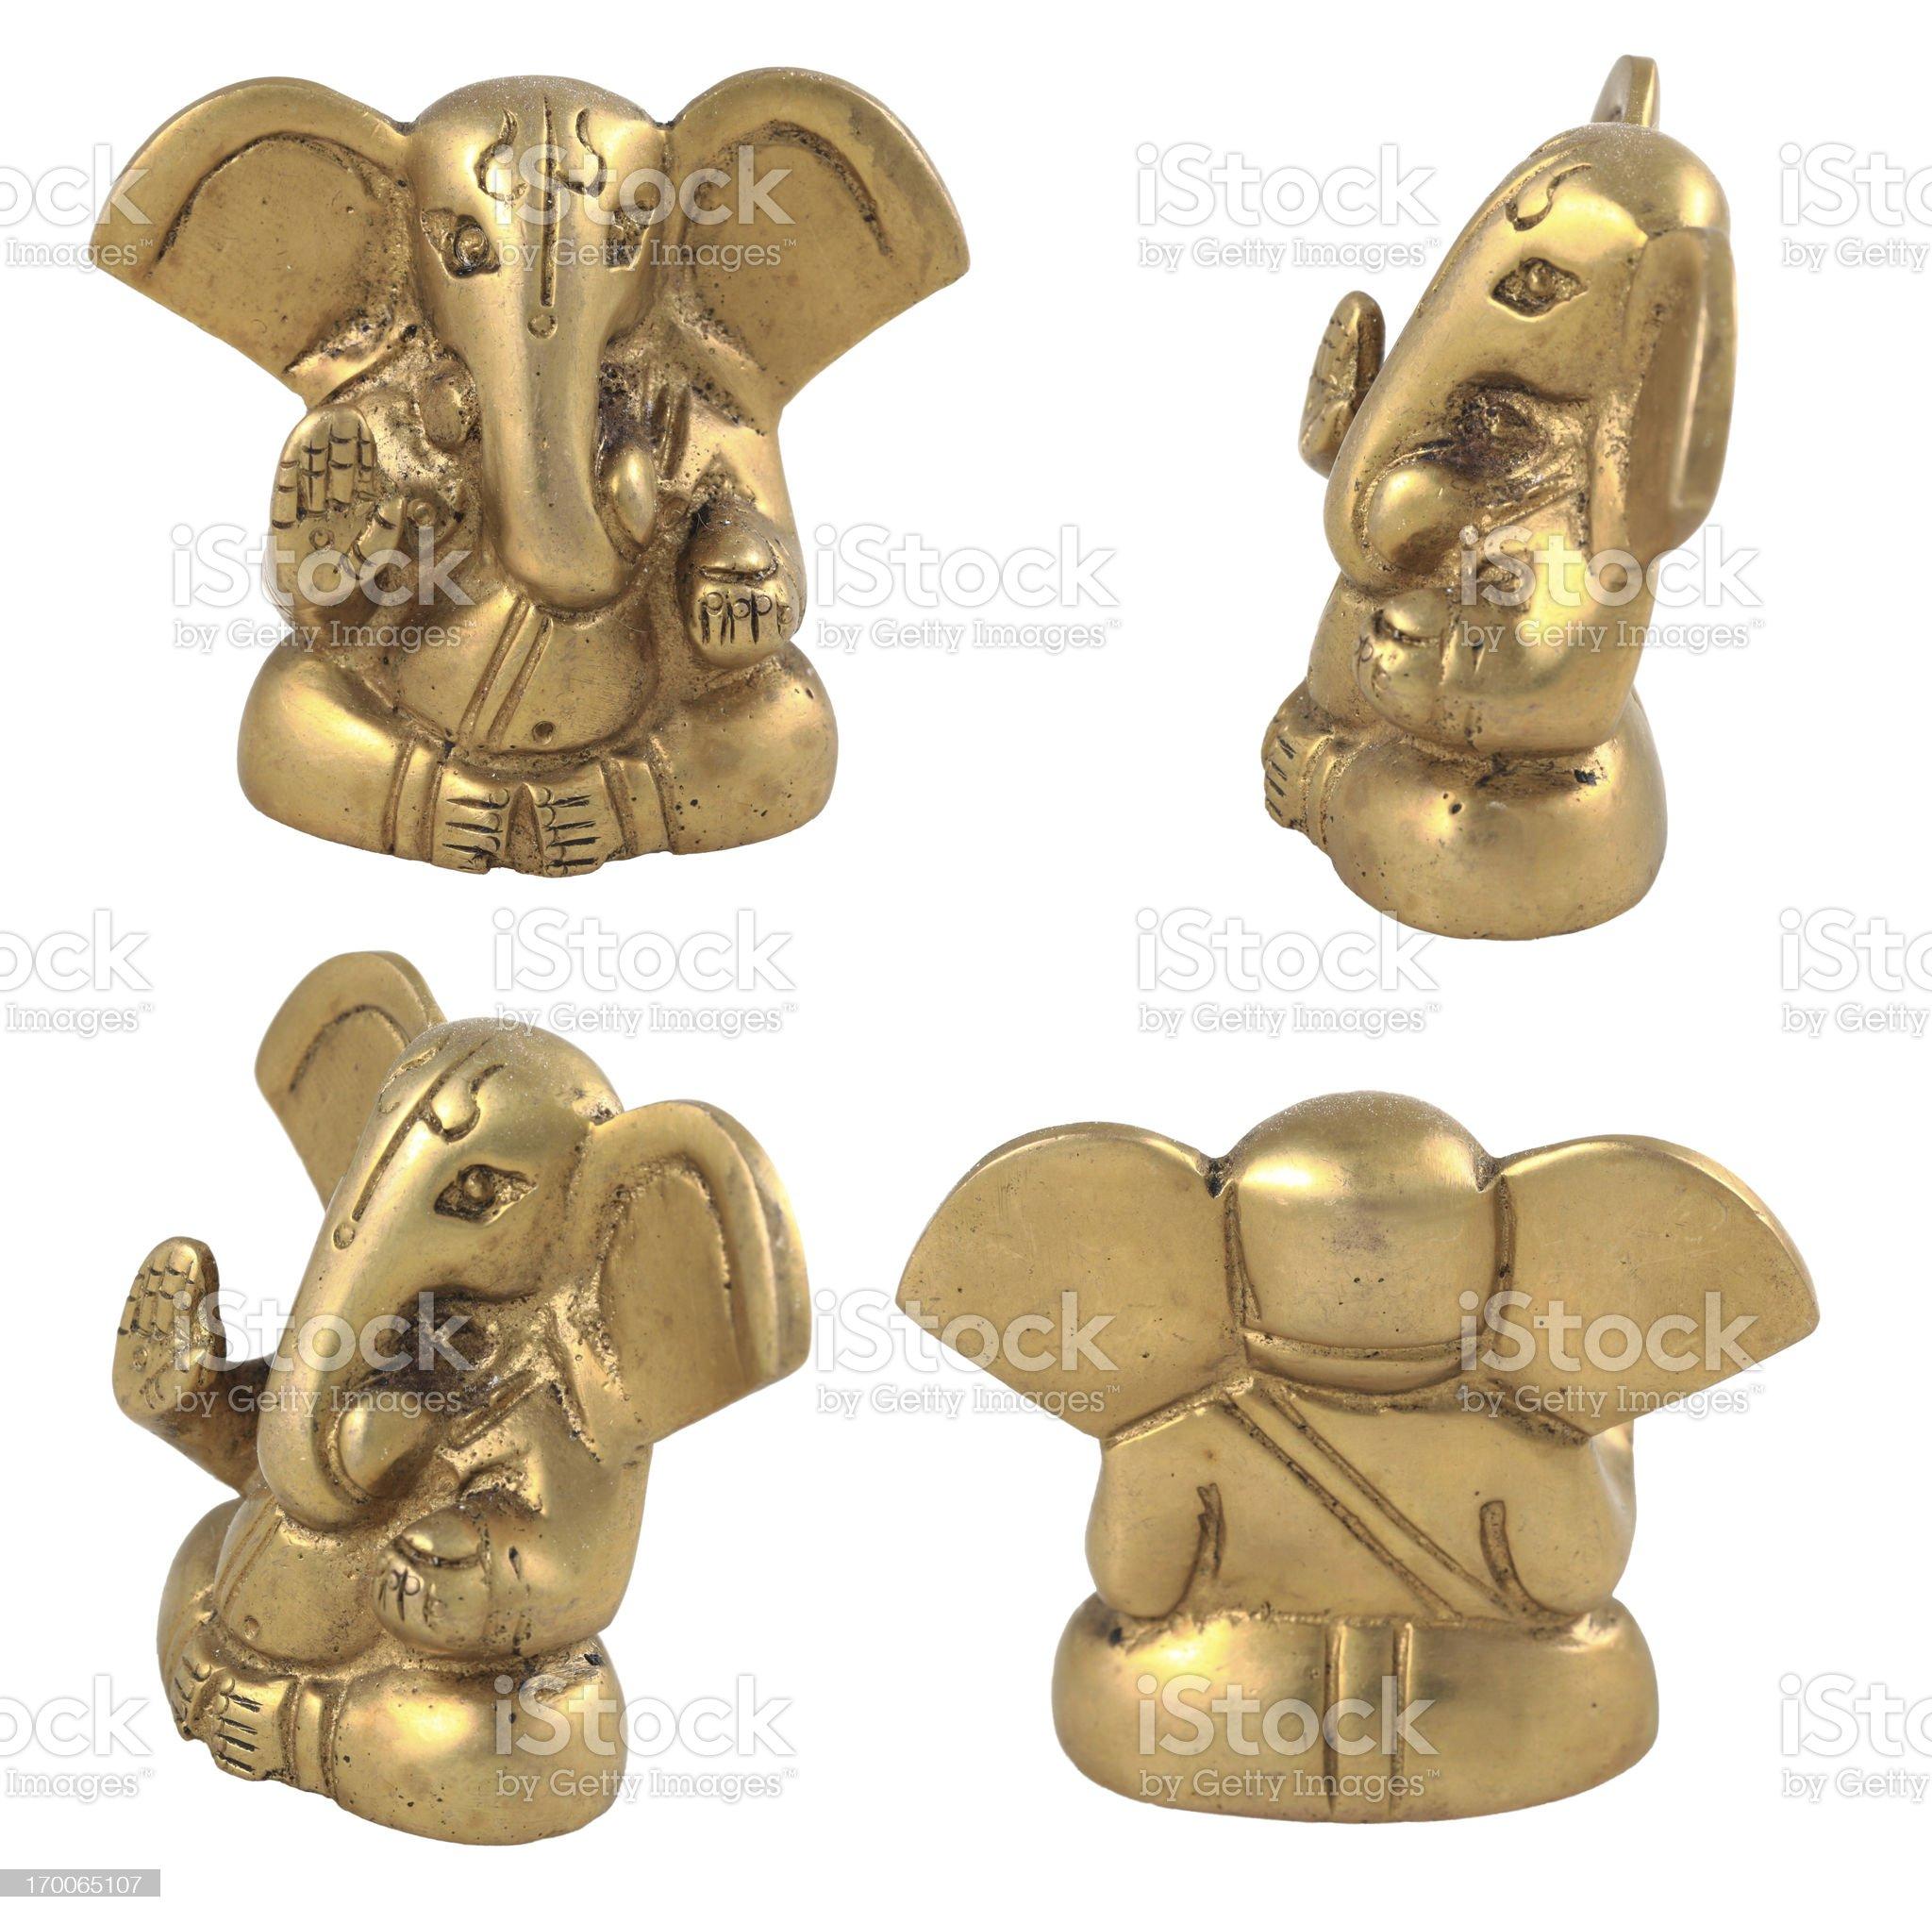 Ganesha statue royalty-free stock photo